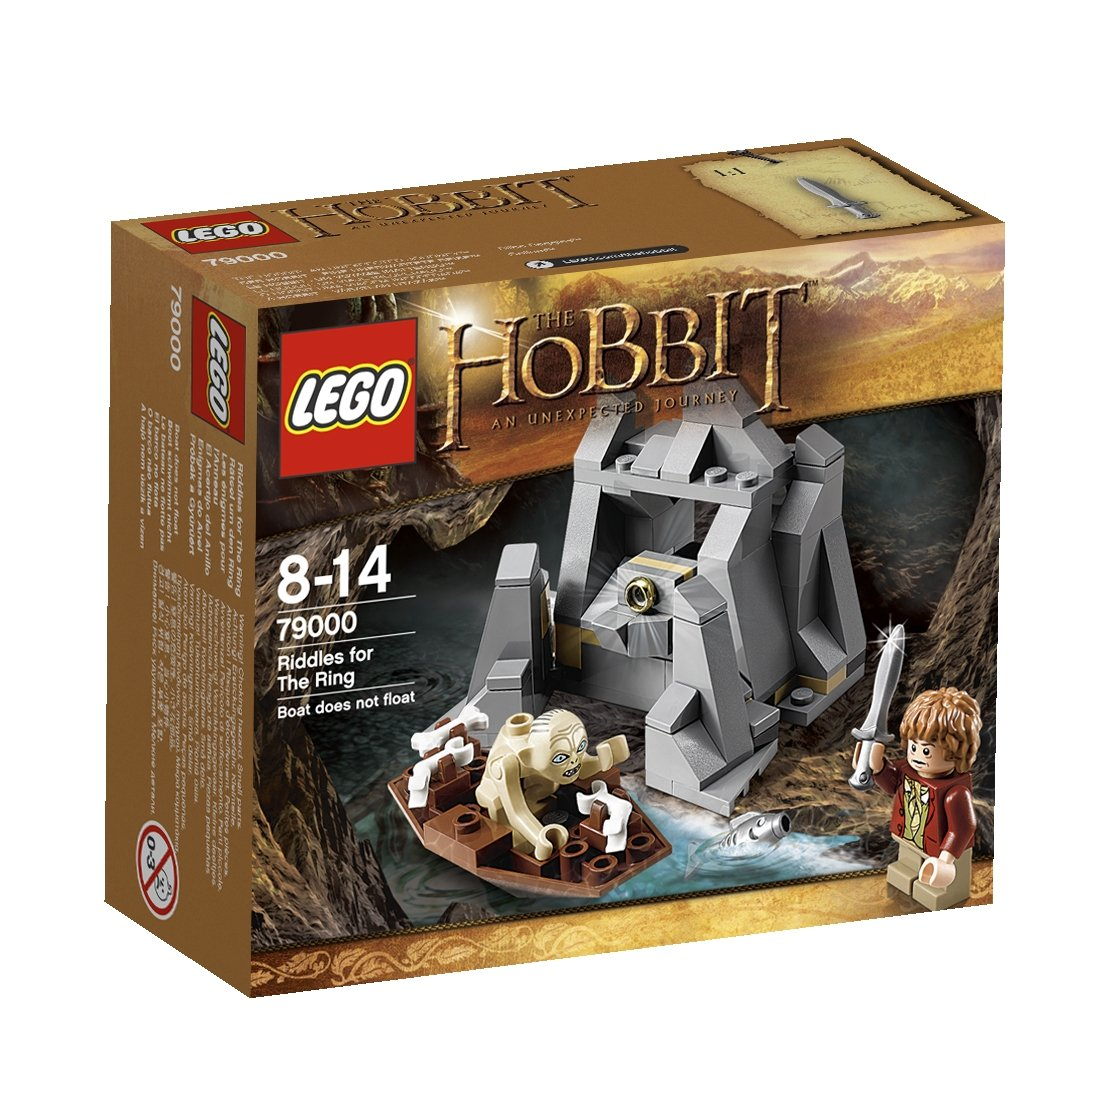 Lego 79001 The Hobbit Spider Net Cloth Bag Minifigure Accessory